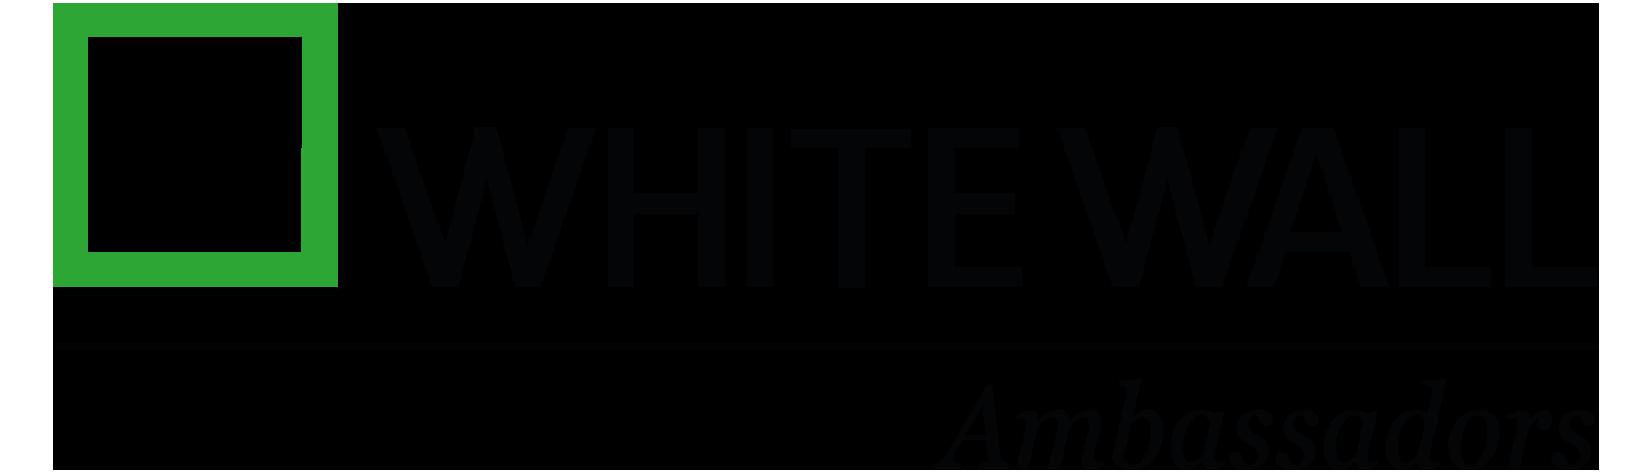 WhiteWall Ambassadors logo